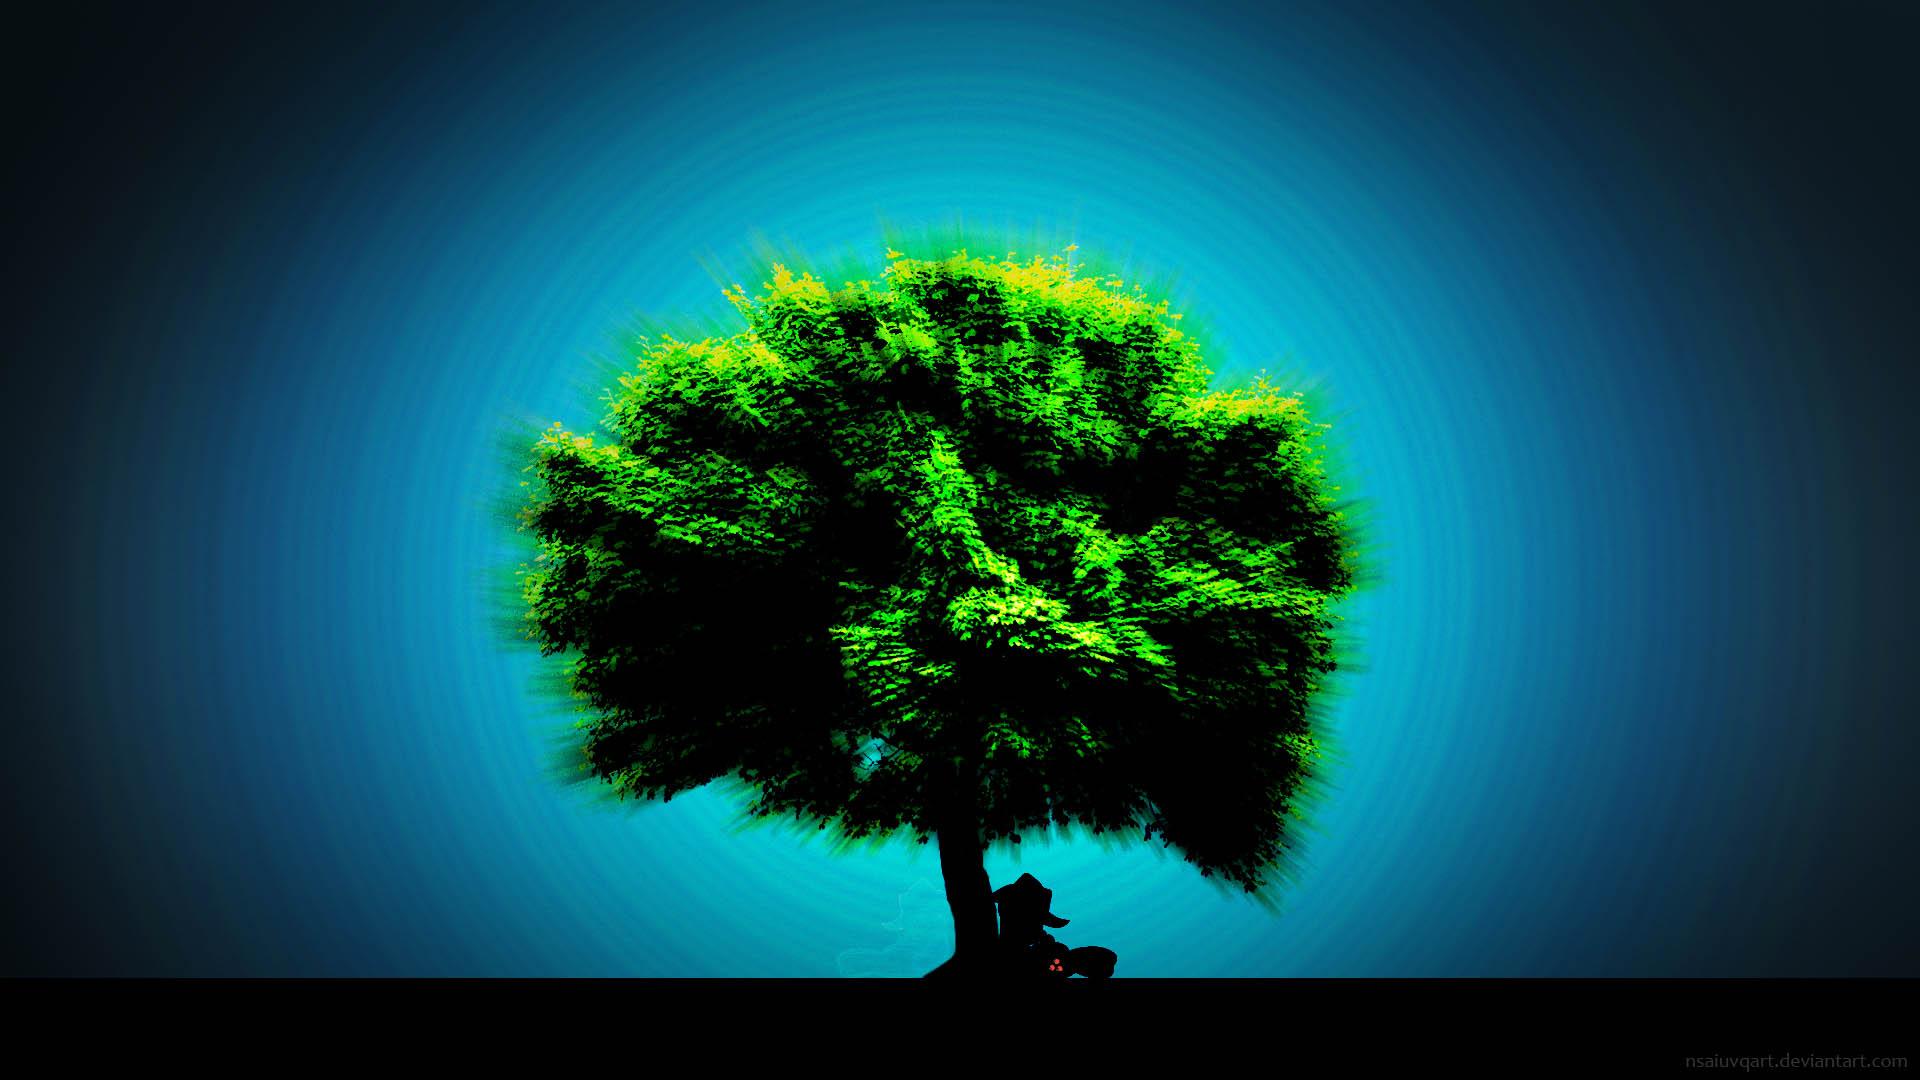 Tree of Life Lovely HD Wallpaper 1920x1080